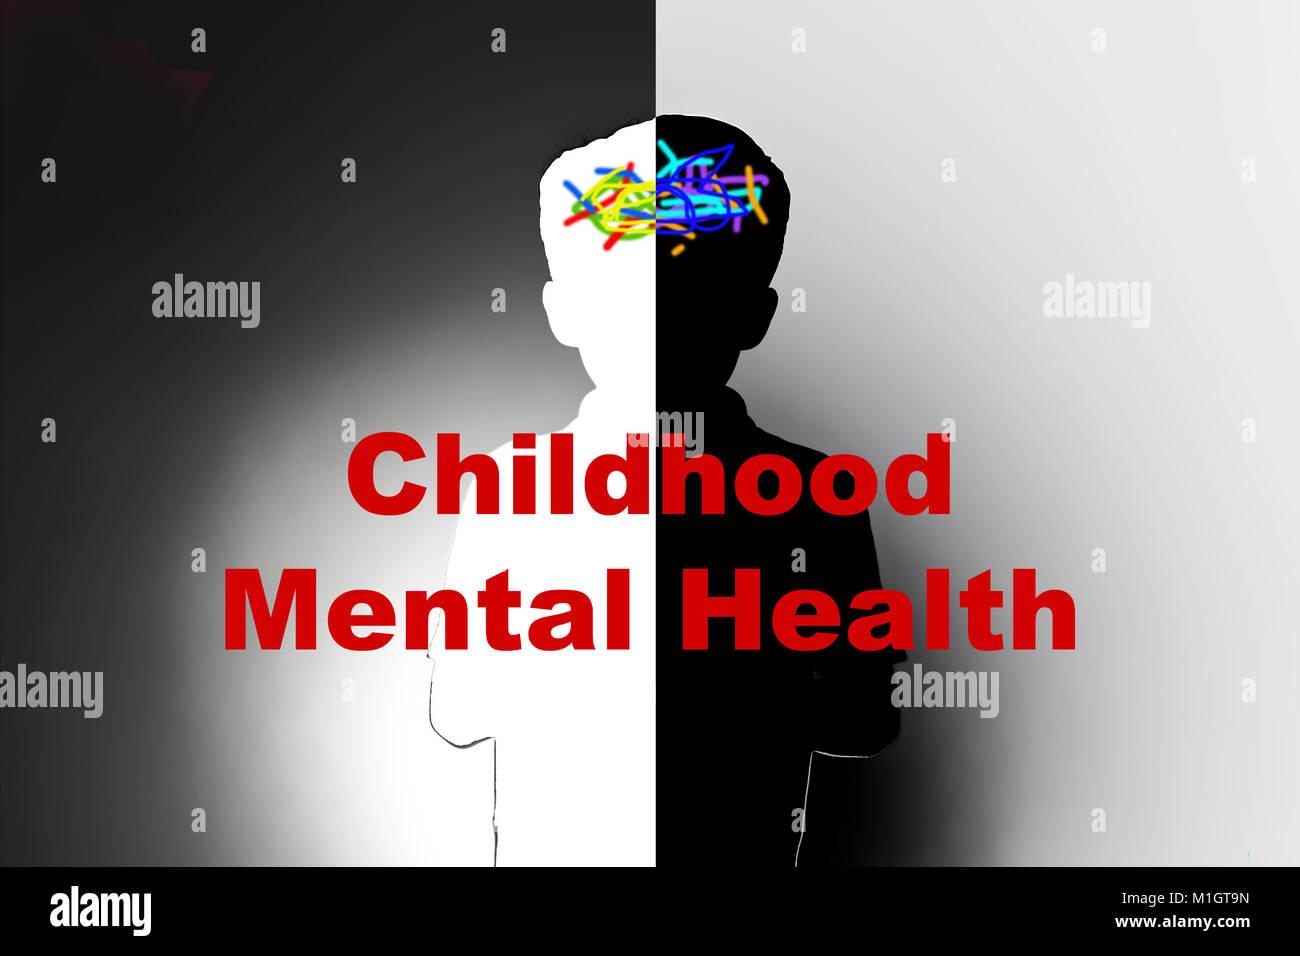 childhood mental health, safeguarding children and social care, mental illness - Stock Image